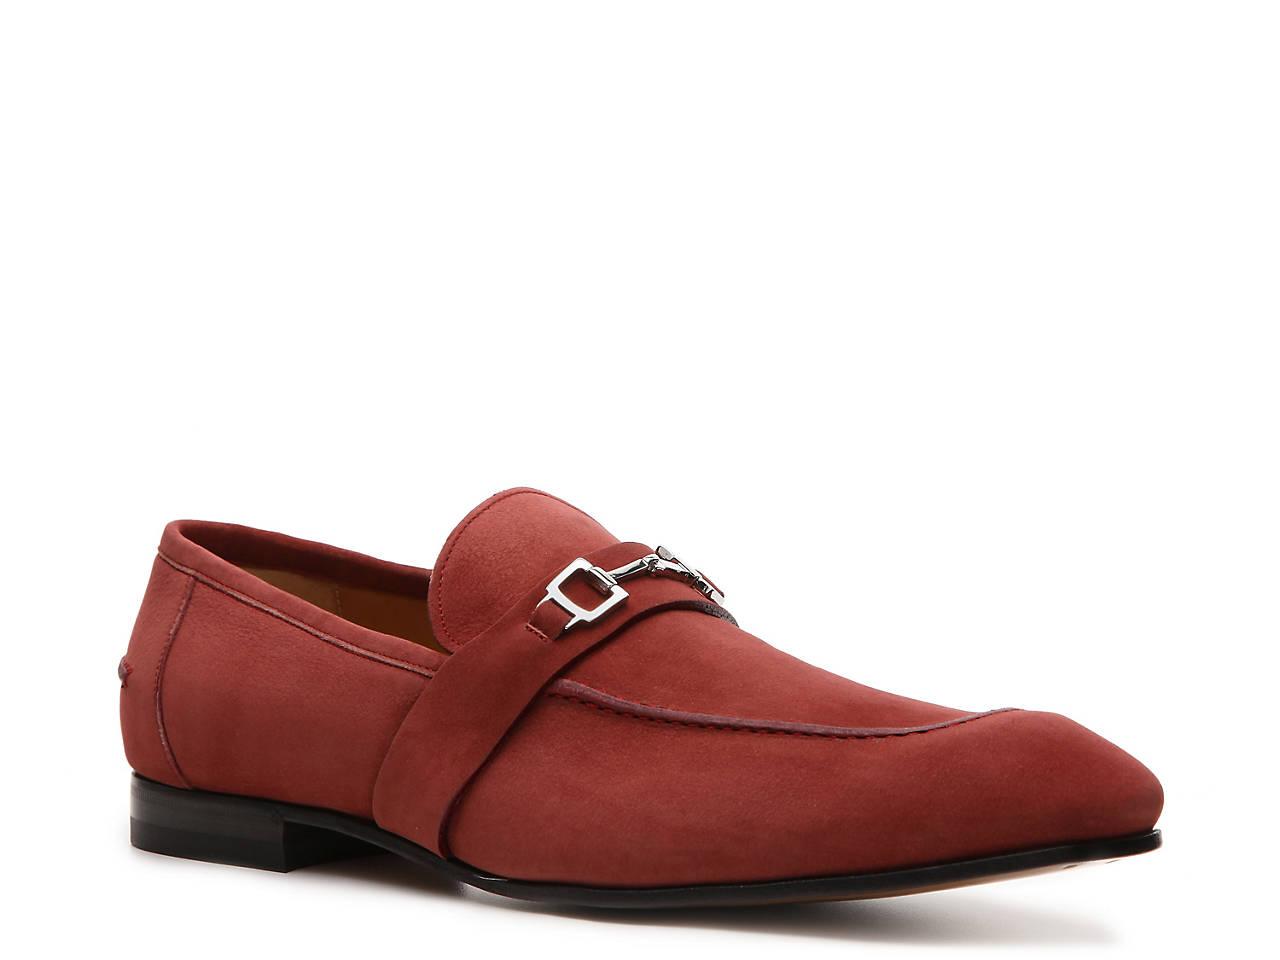 f84085d003c1 Gucci Suede Horsebit Loafer Women s Shoes